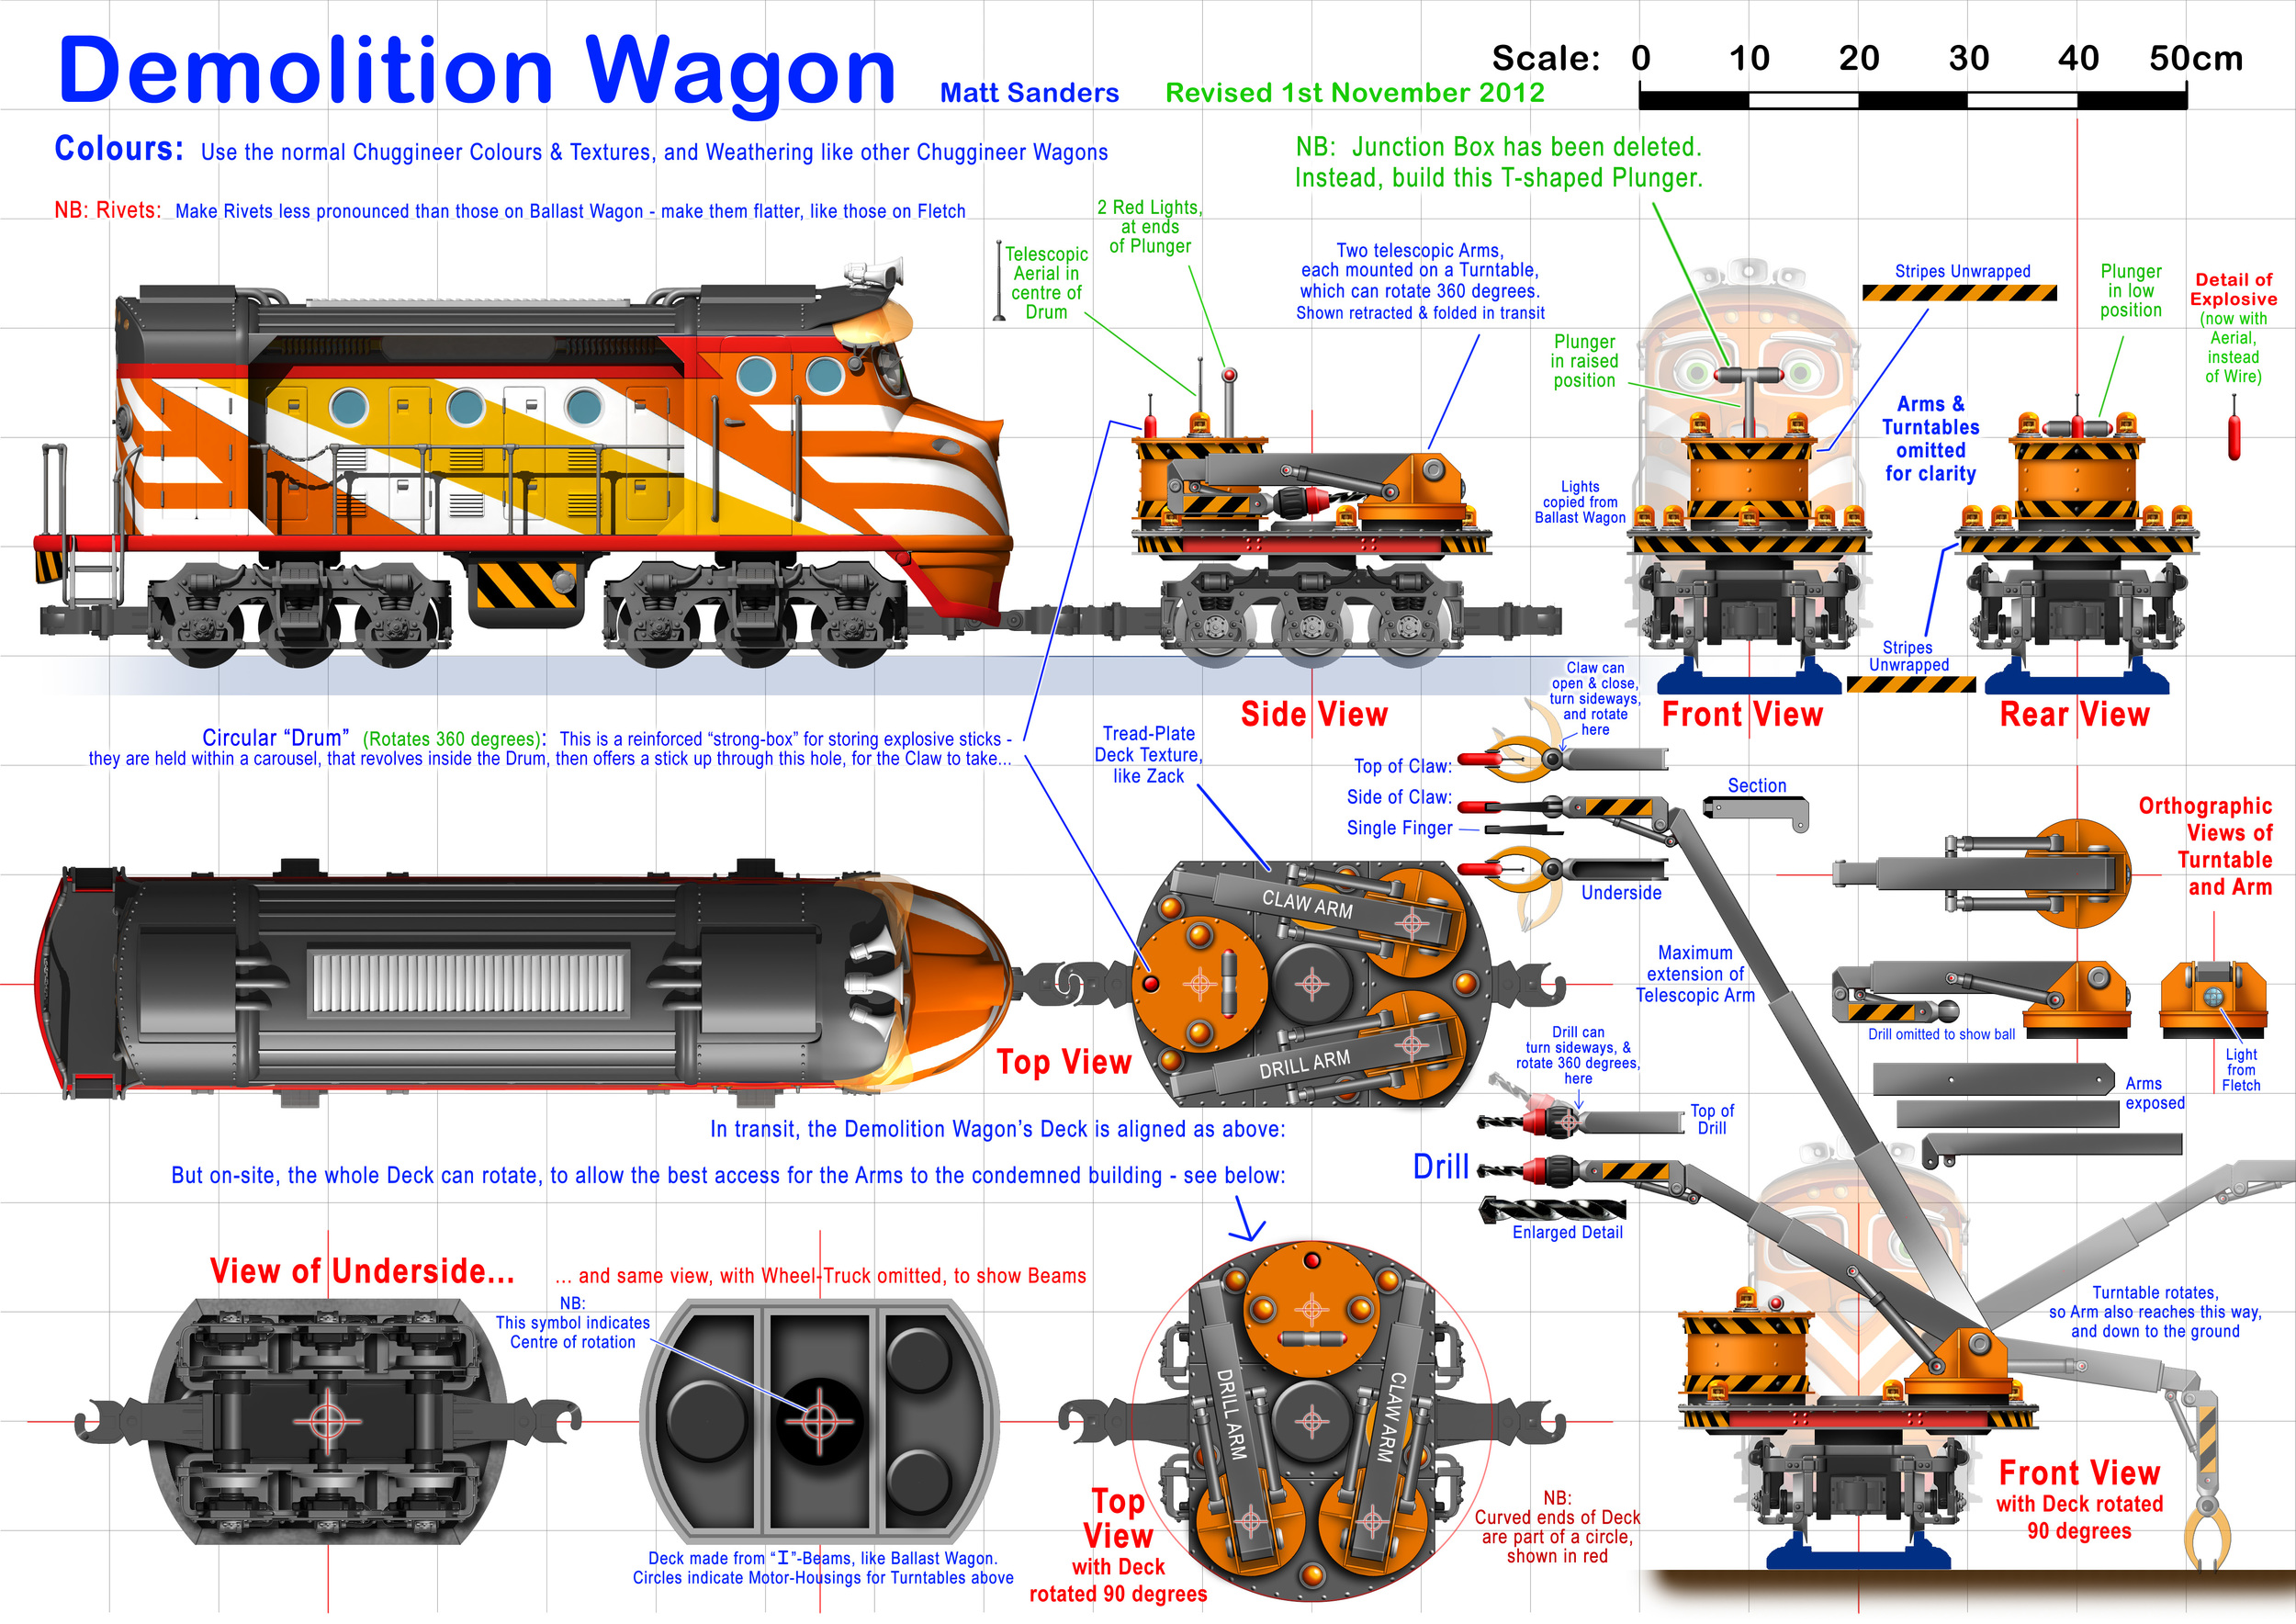 Demolition Wagon 1 November.jpg